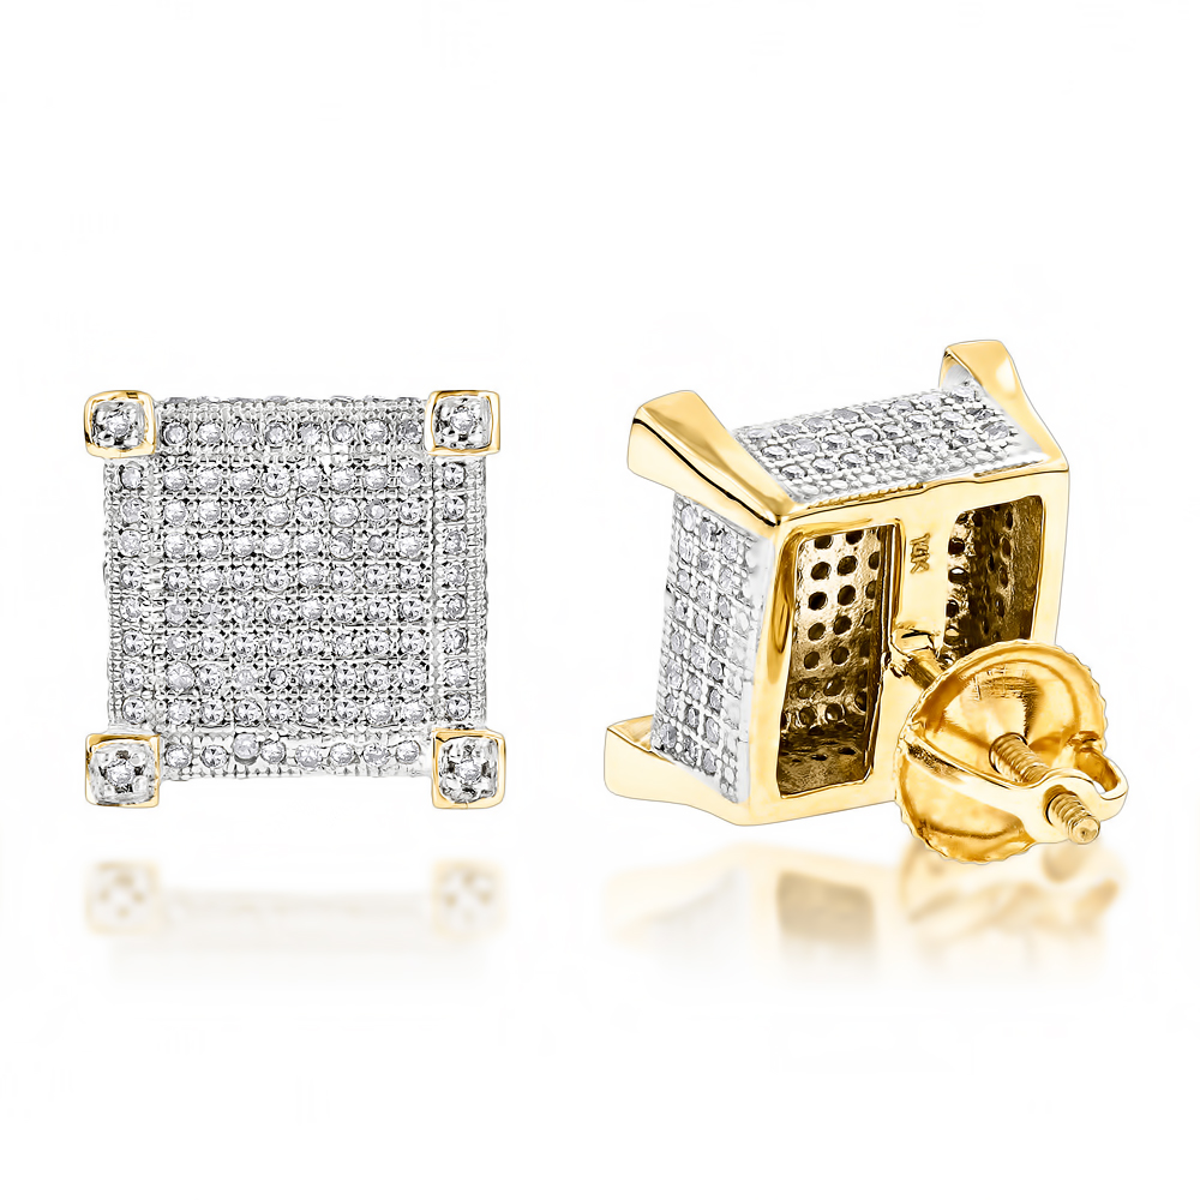 Real 14K Gold Diamond Stud Earrings 0.85ct